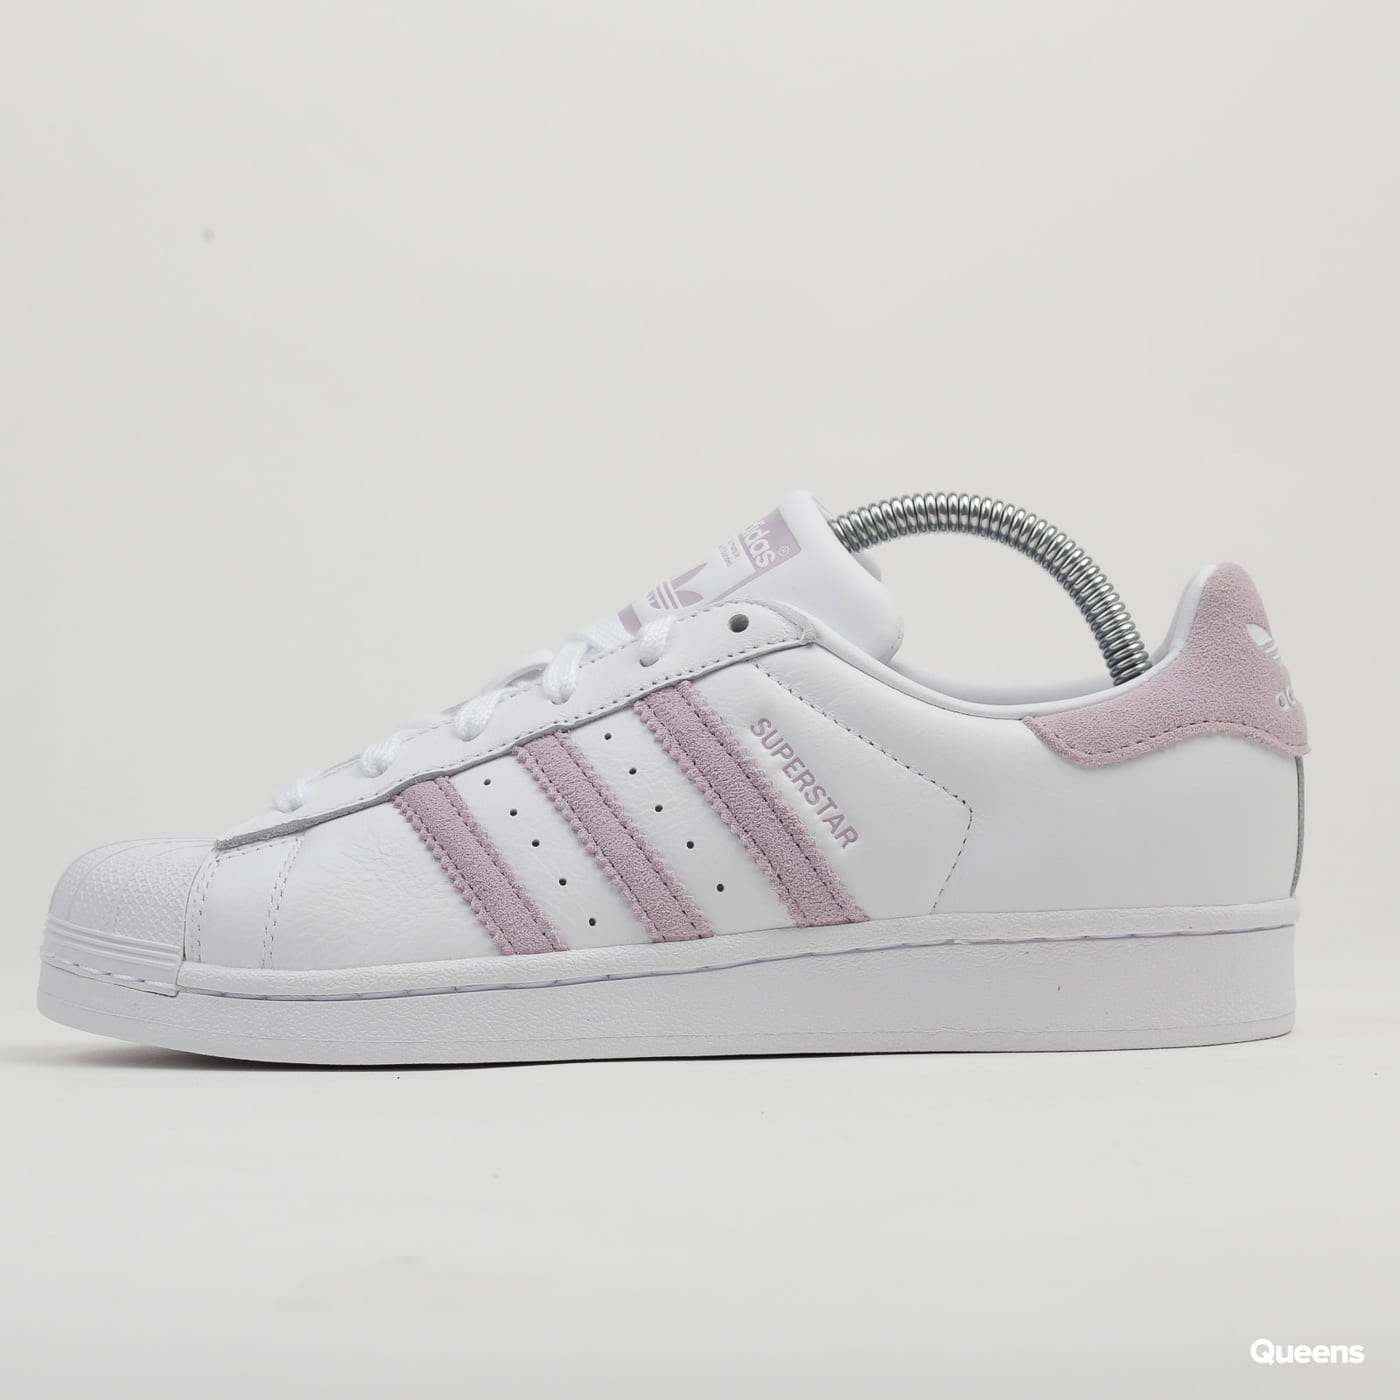 adidas superstar light pink 38